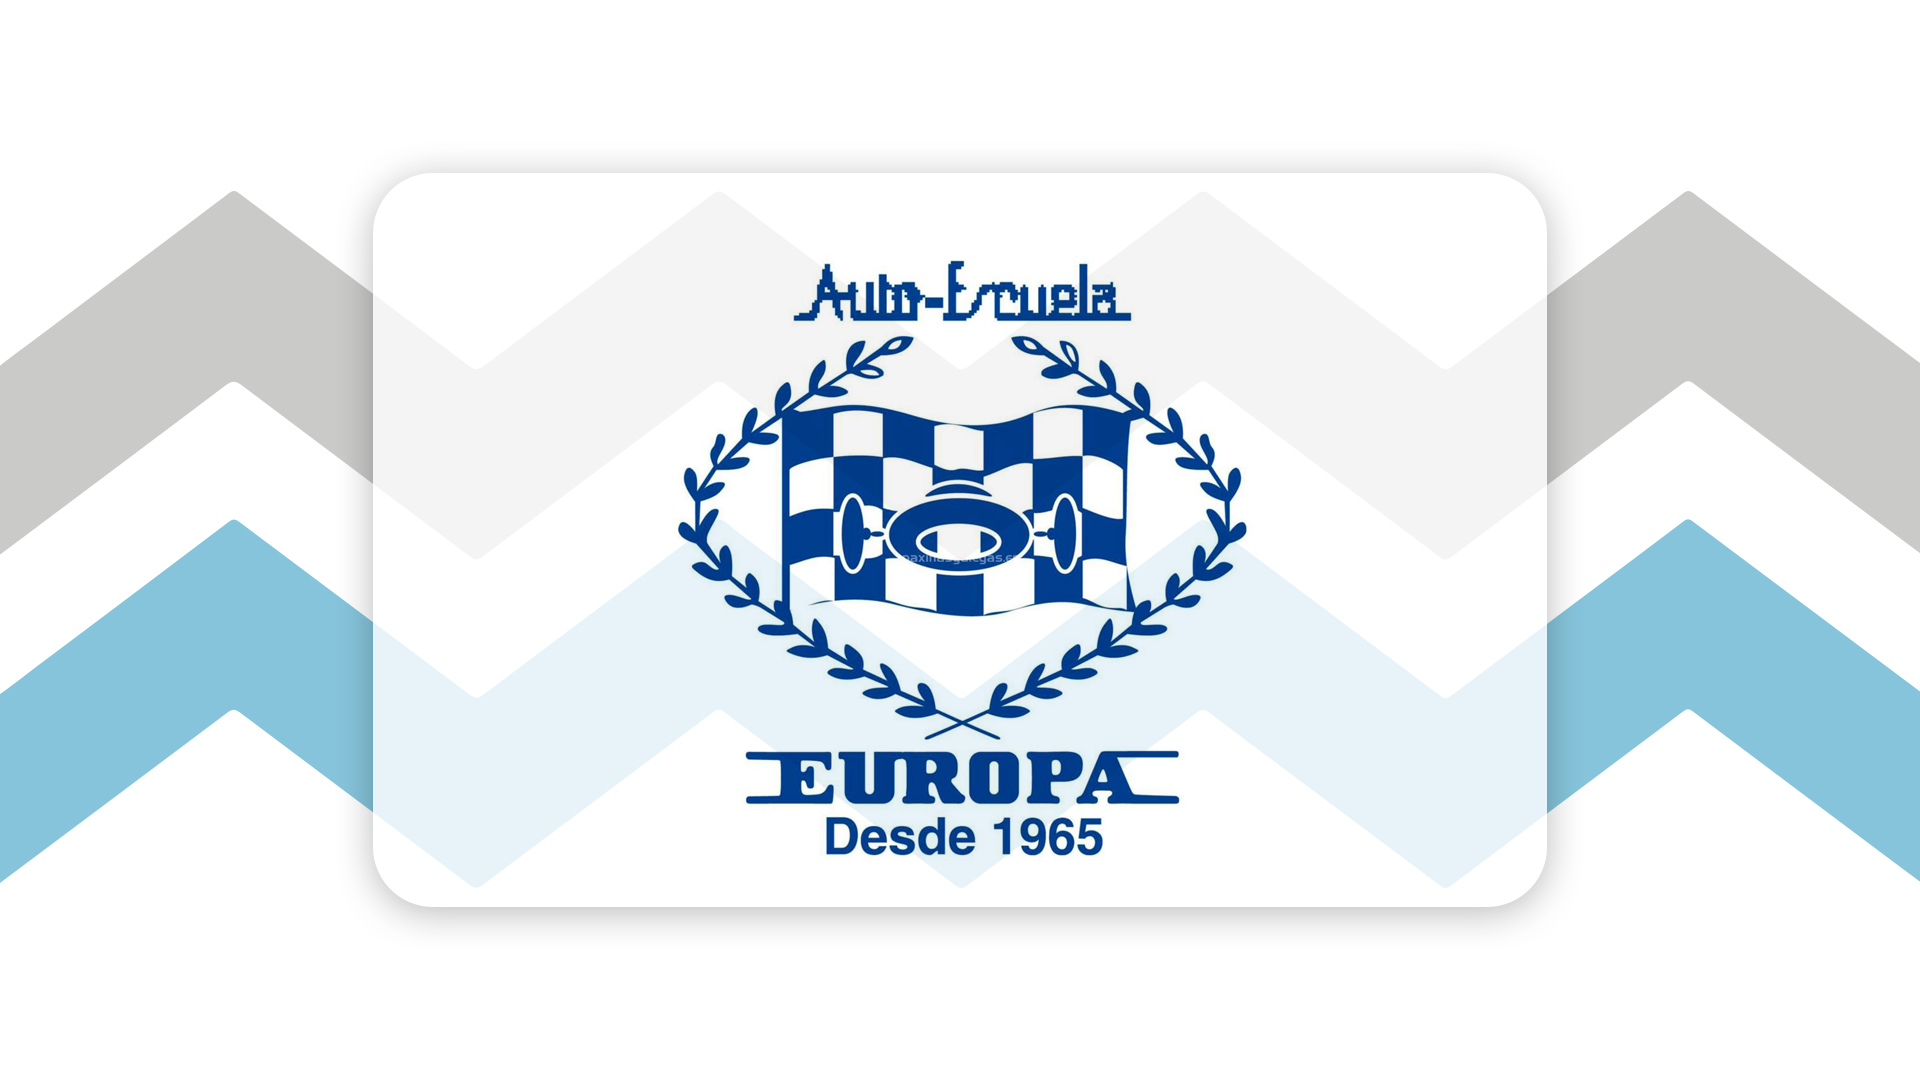 Autoescuela Europa